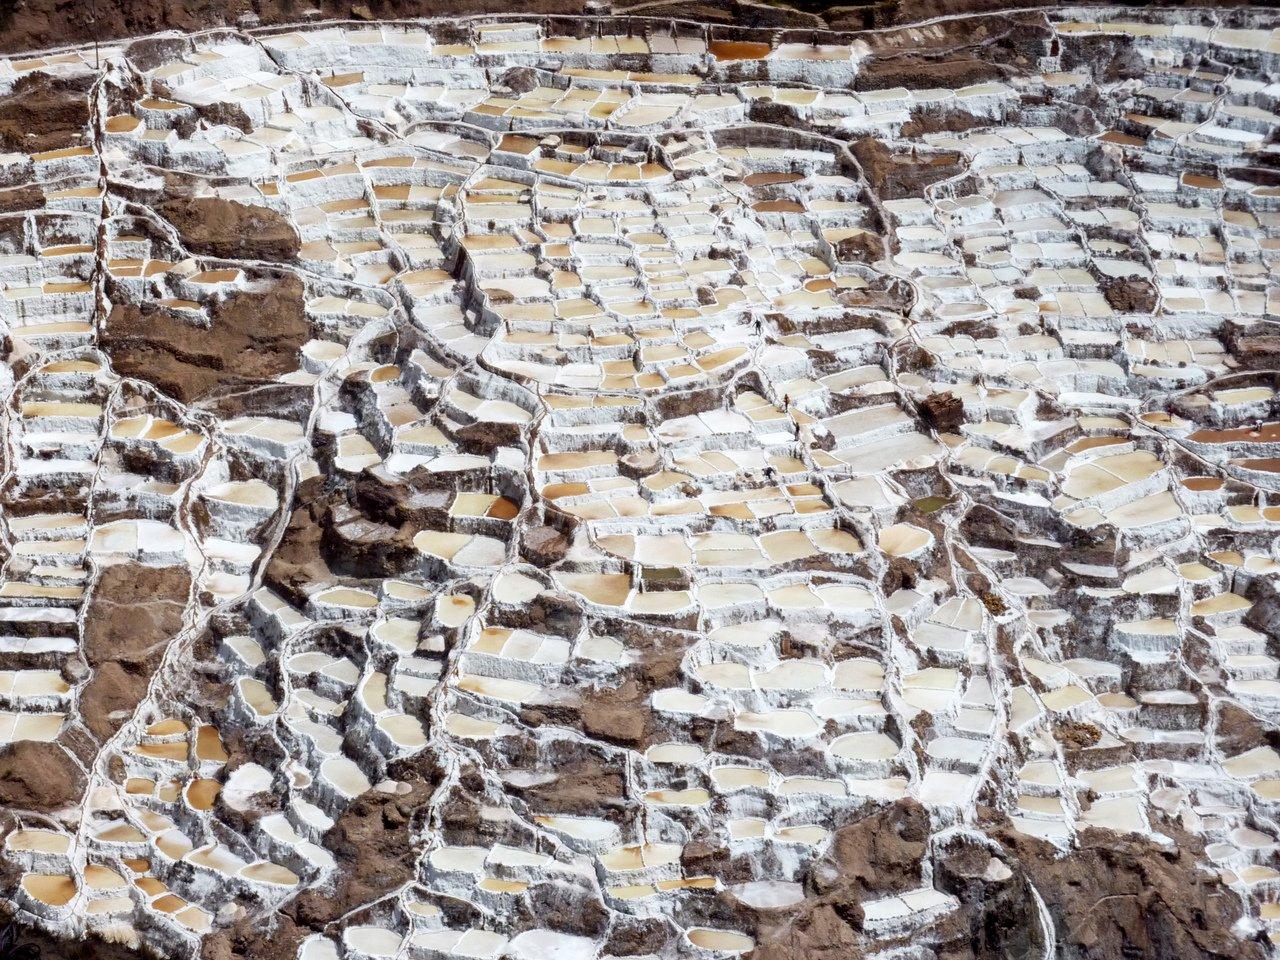 tour della valle sacra: le salinas di maras